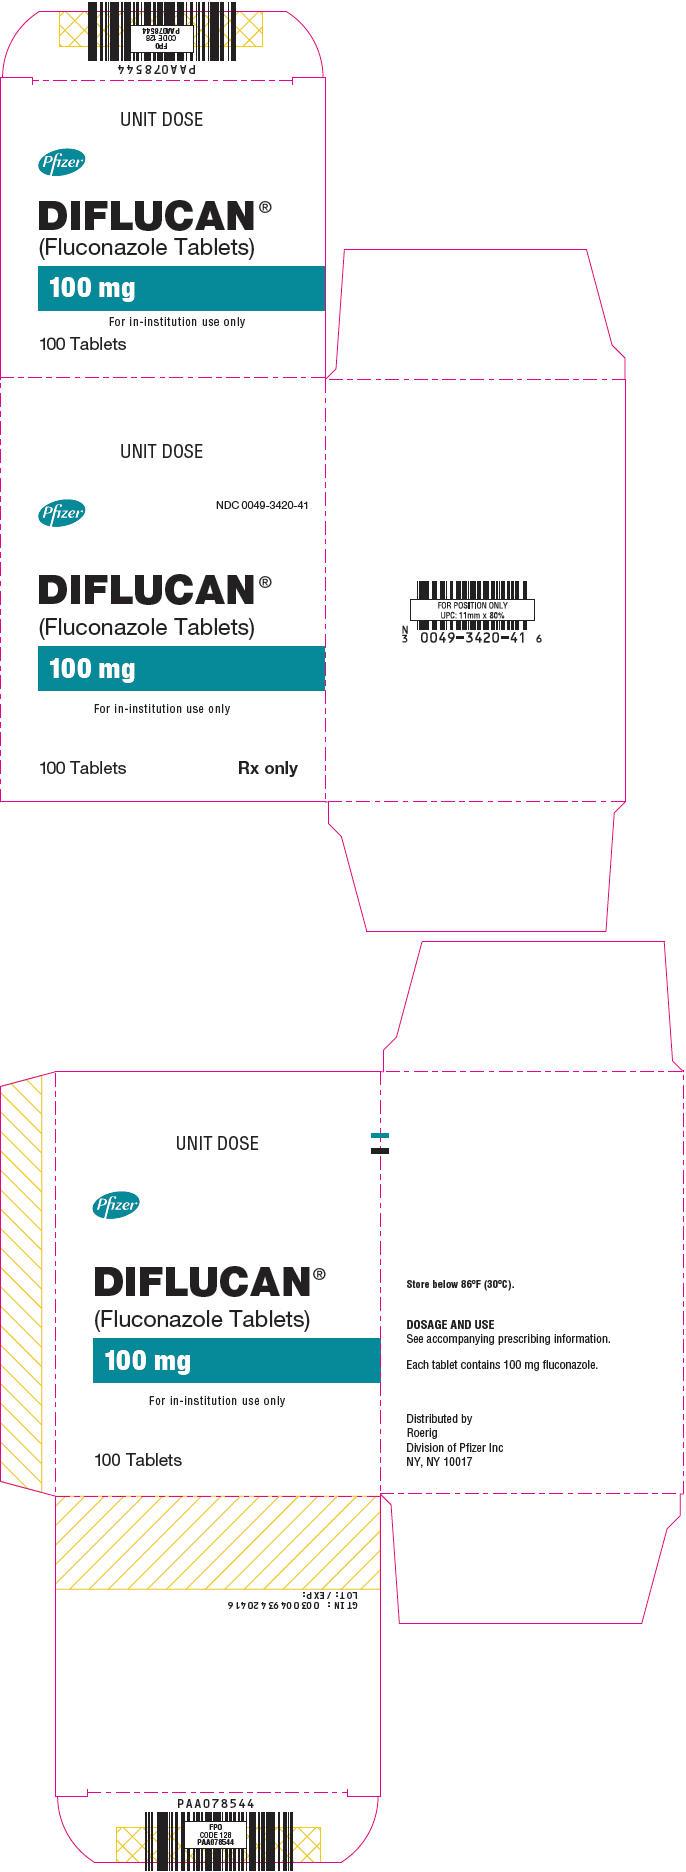 Principal Display Panel - 100 mg Tablet Blister Pack Carton